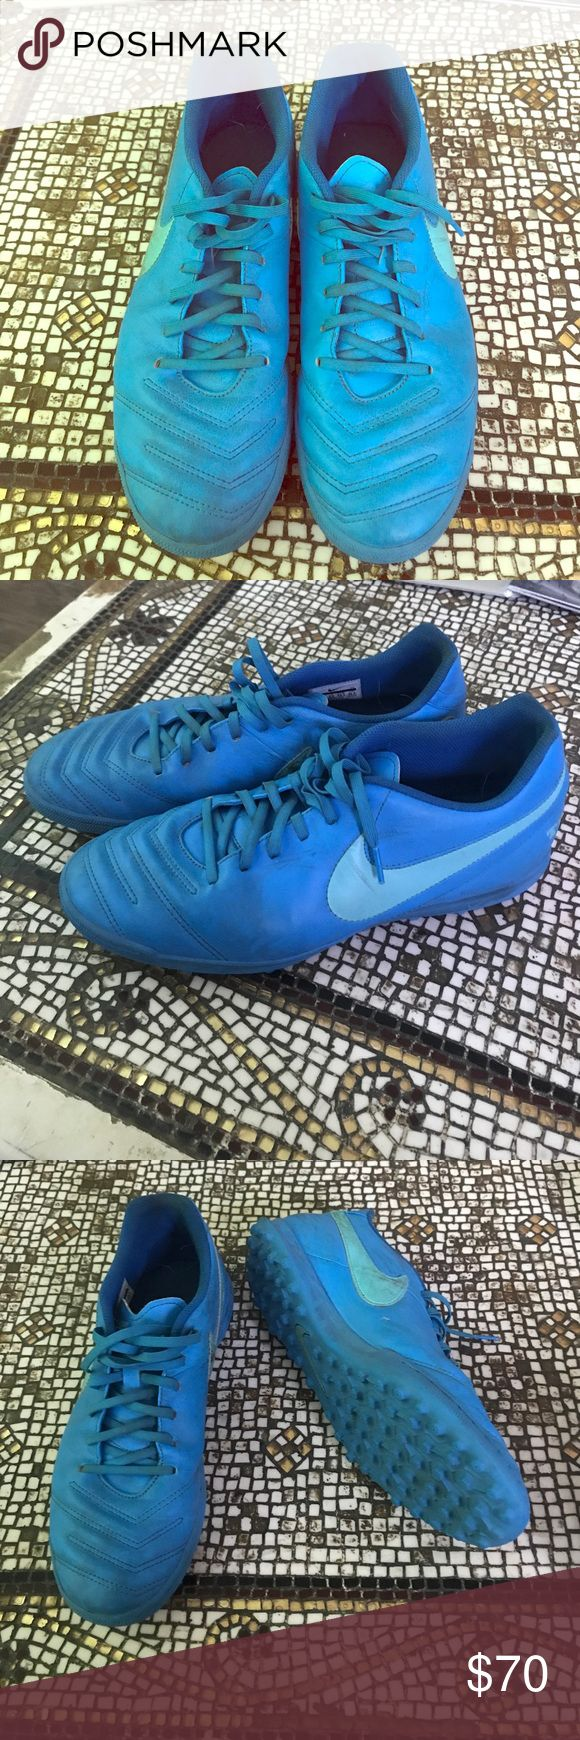 Nike Tiempo X Nike Tiempo X Próximo TF artificial Turf soccer shoe- Blue Glow/ polarized/ soar adidas Shoes Athletic Shoes